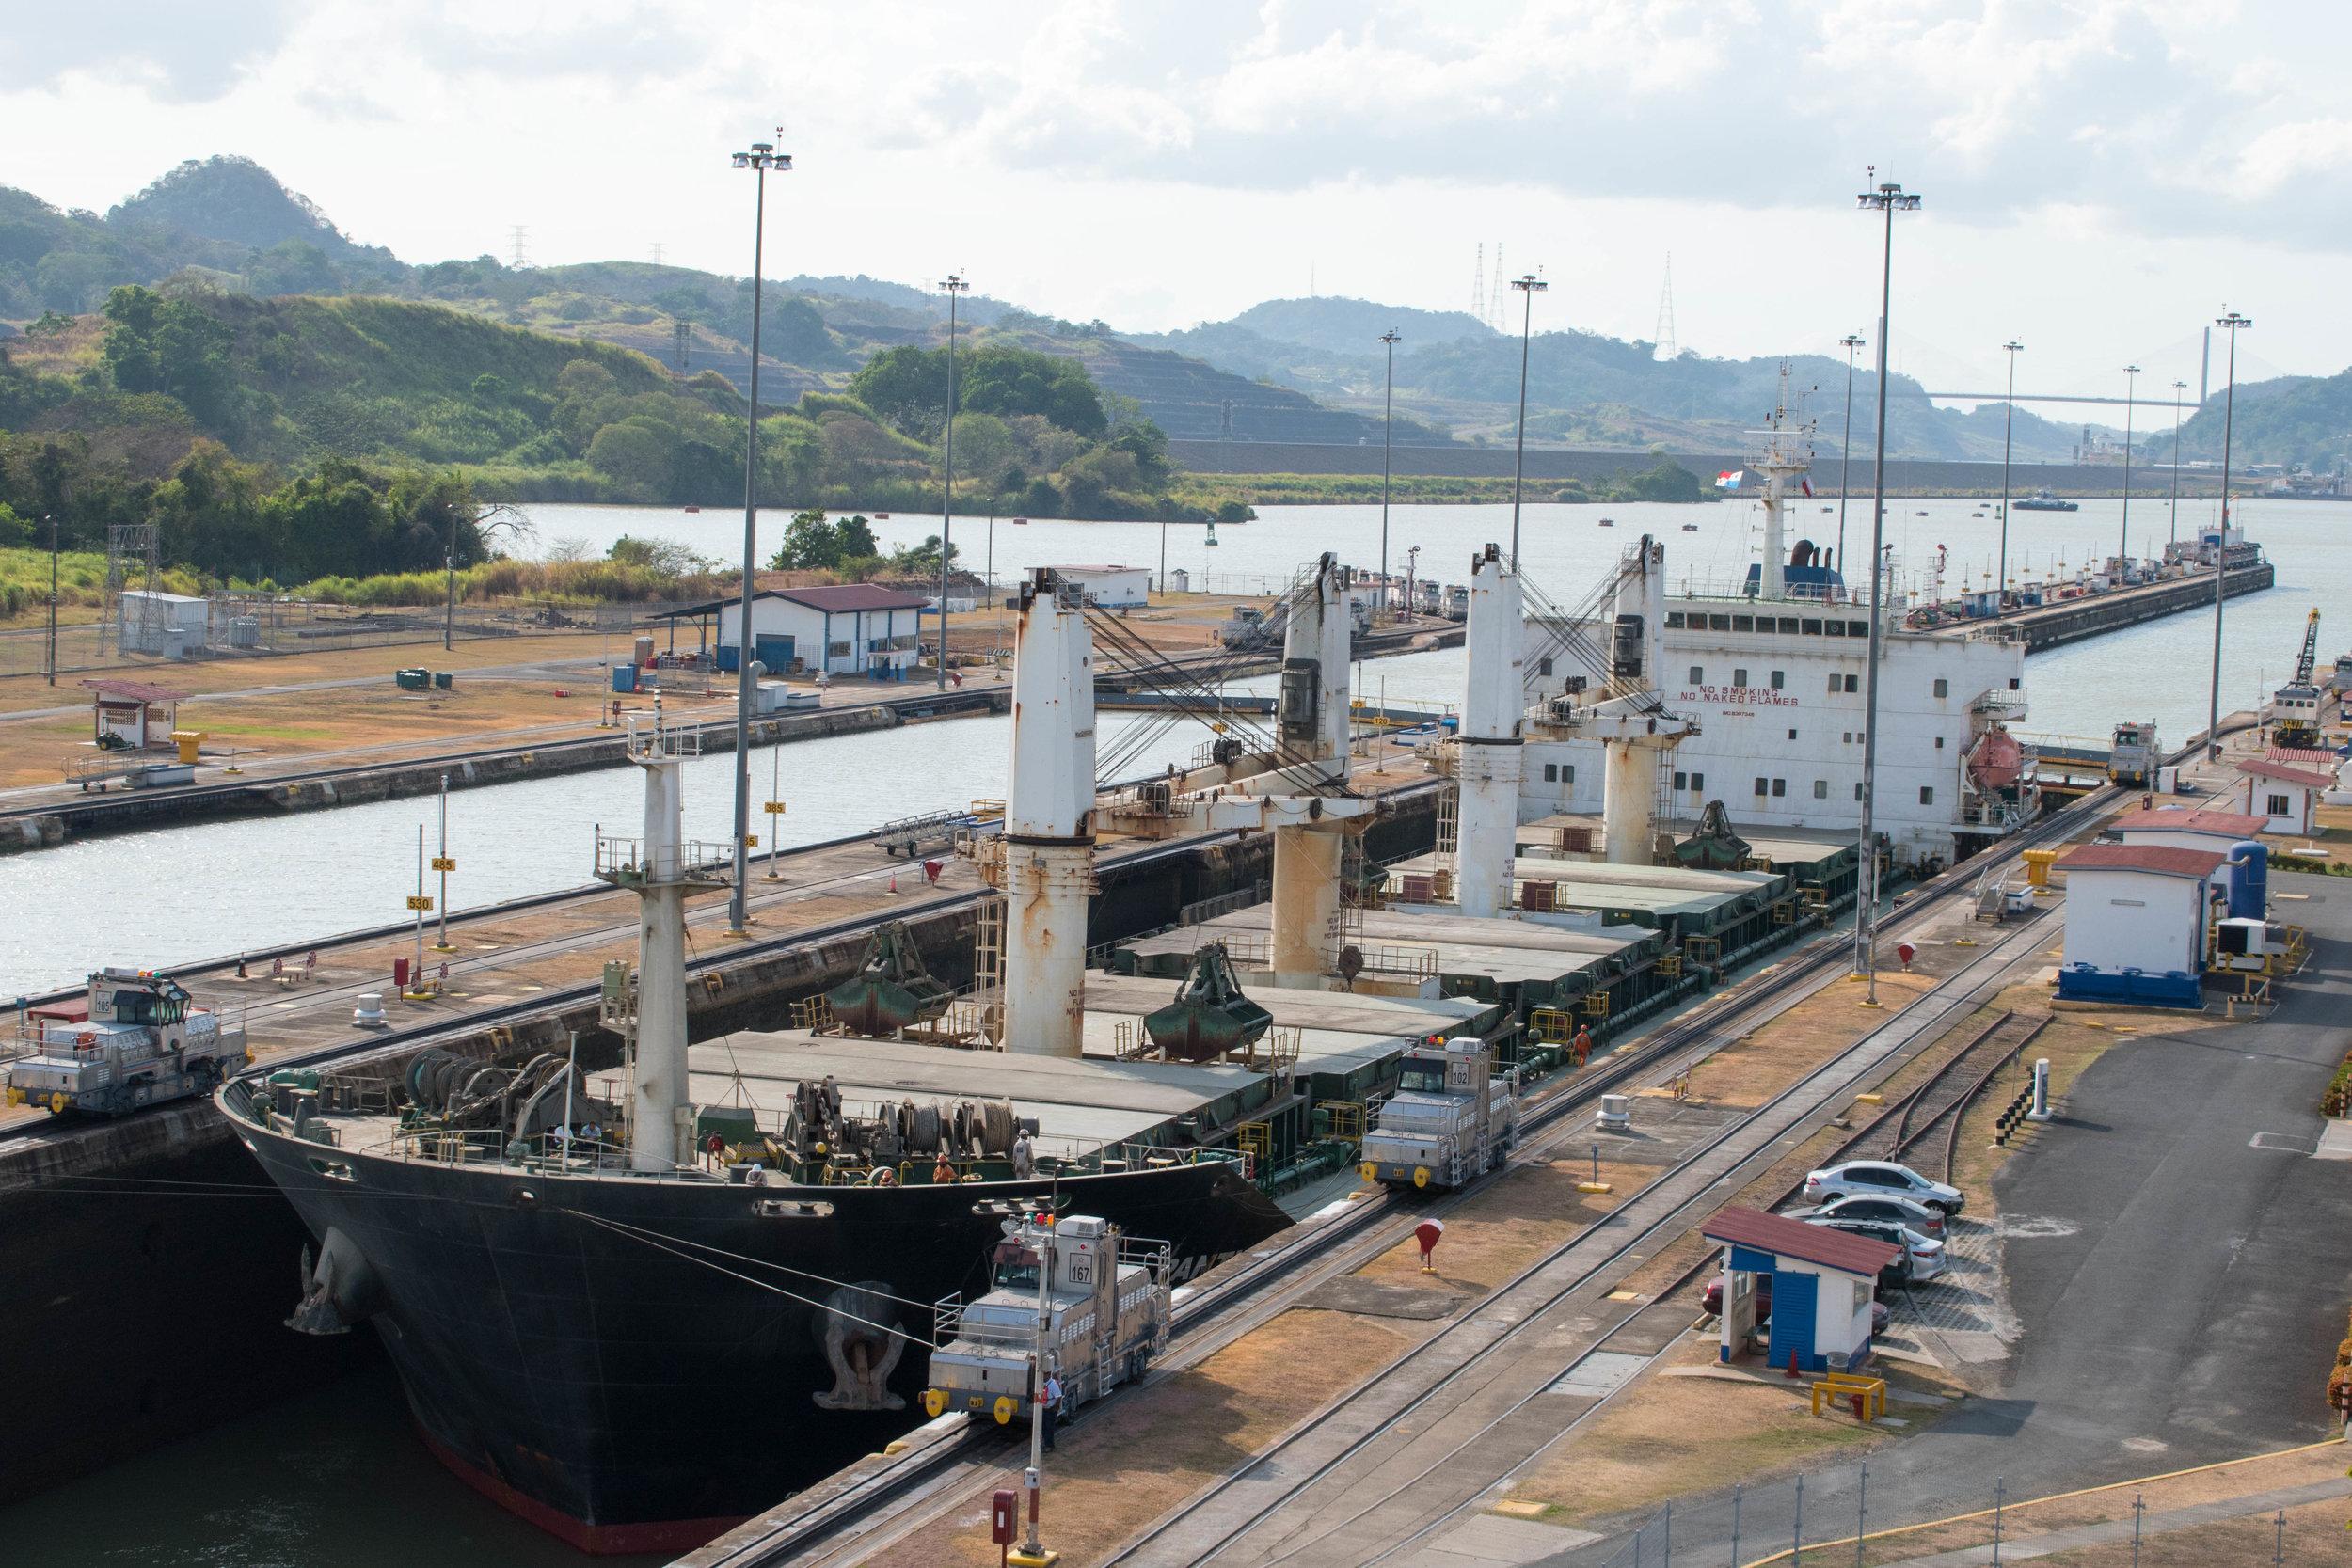 Imposing Cargo Ships Pass Through The Panama Canal